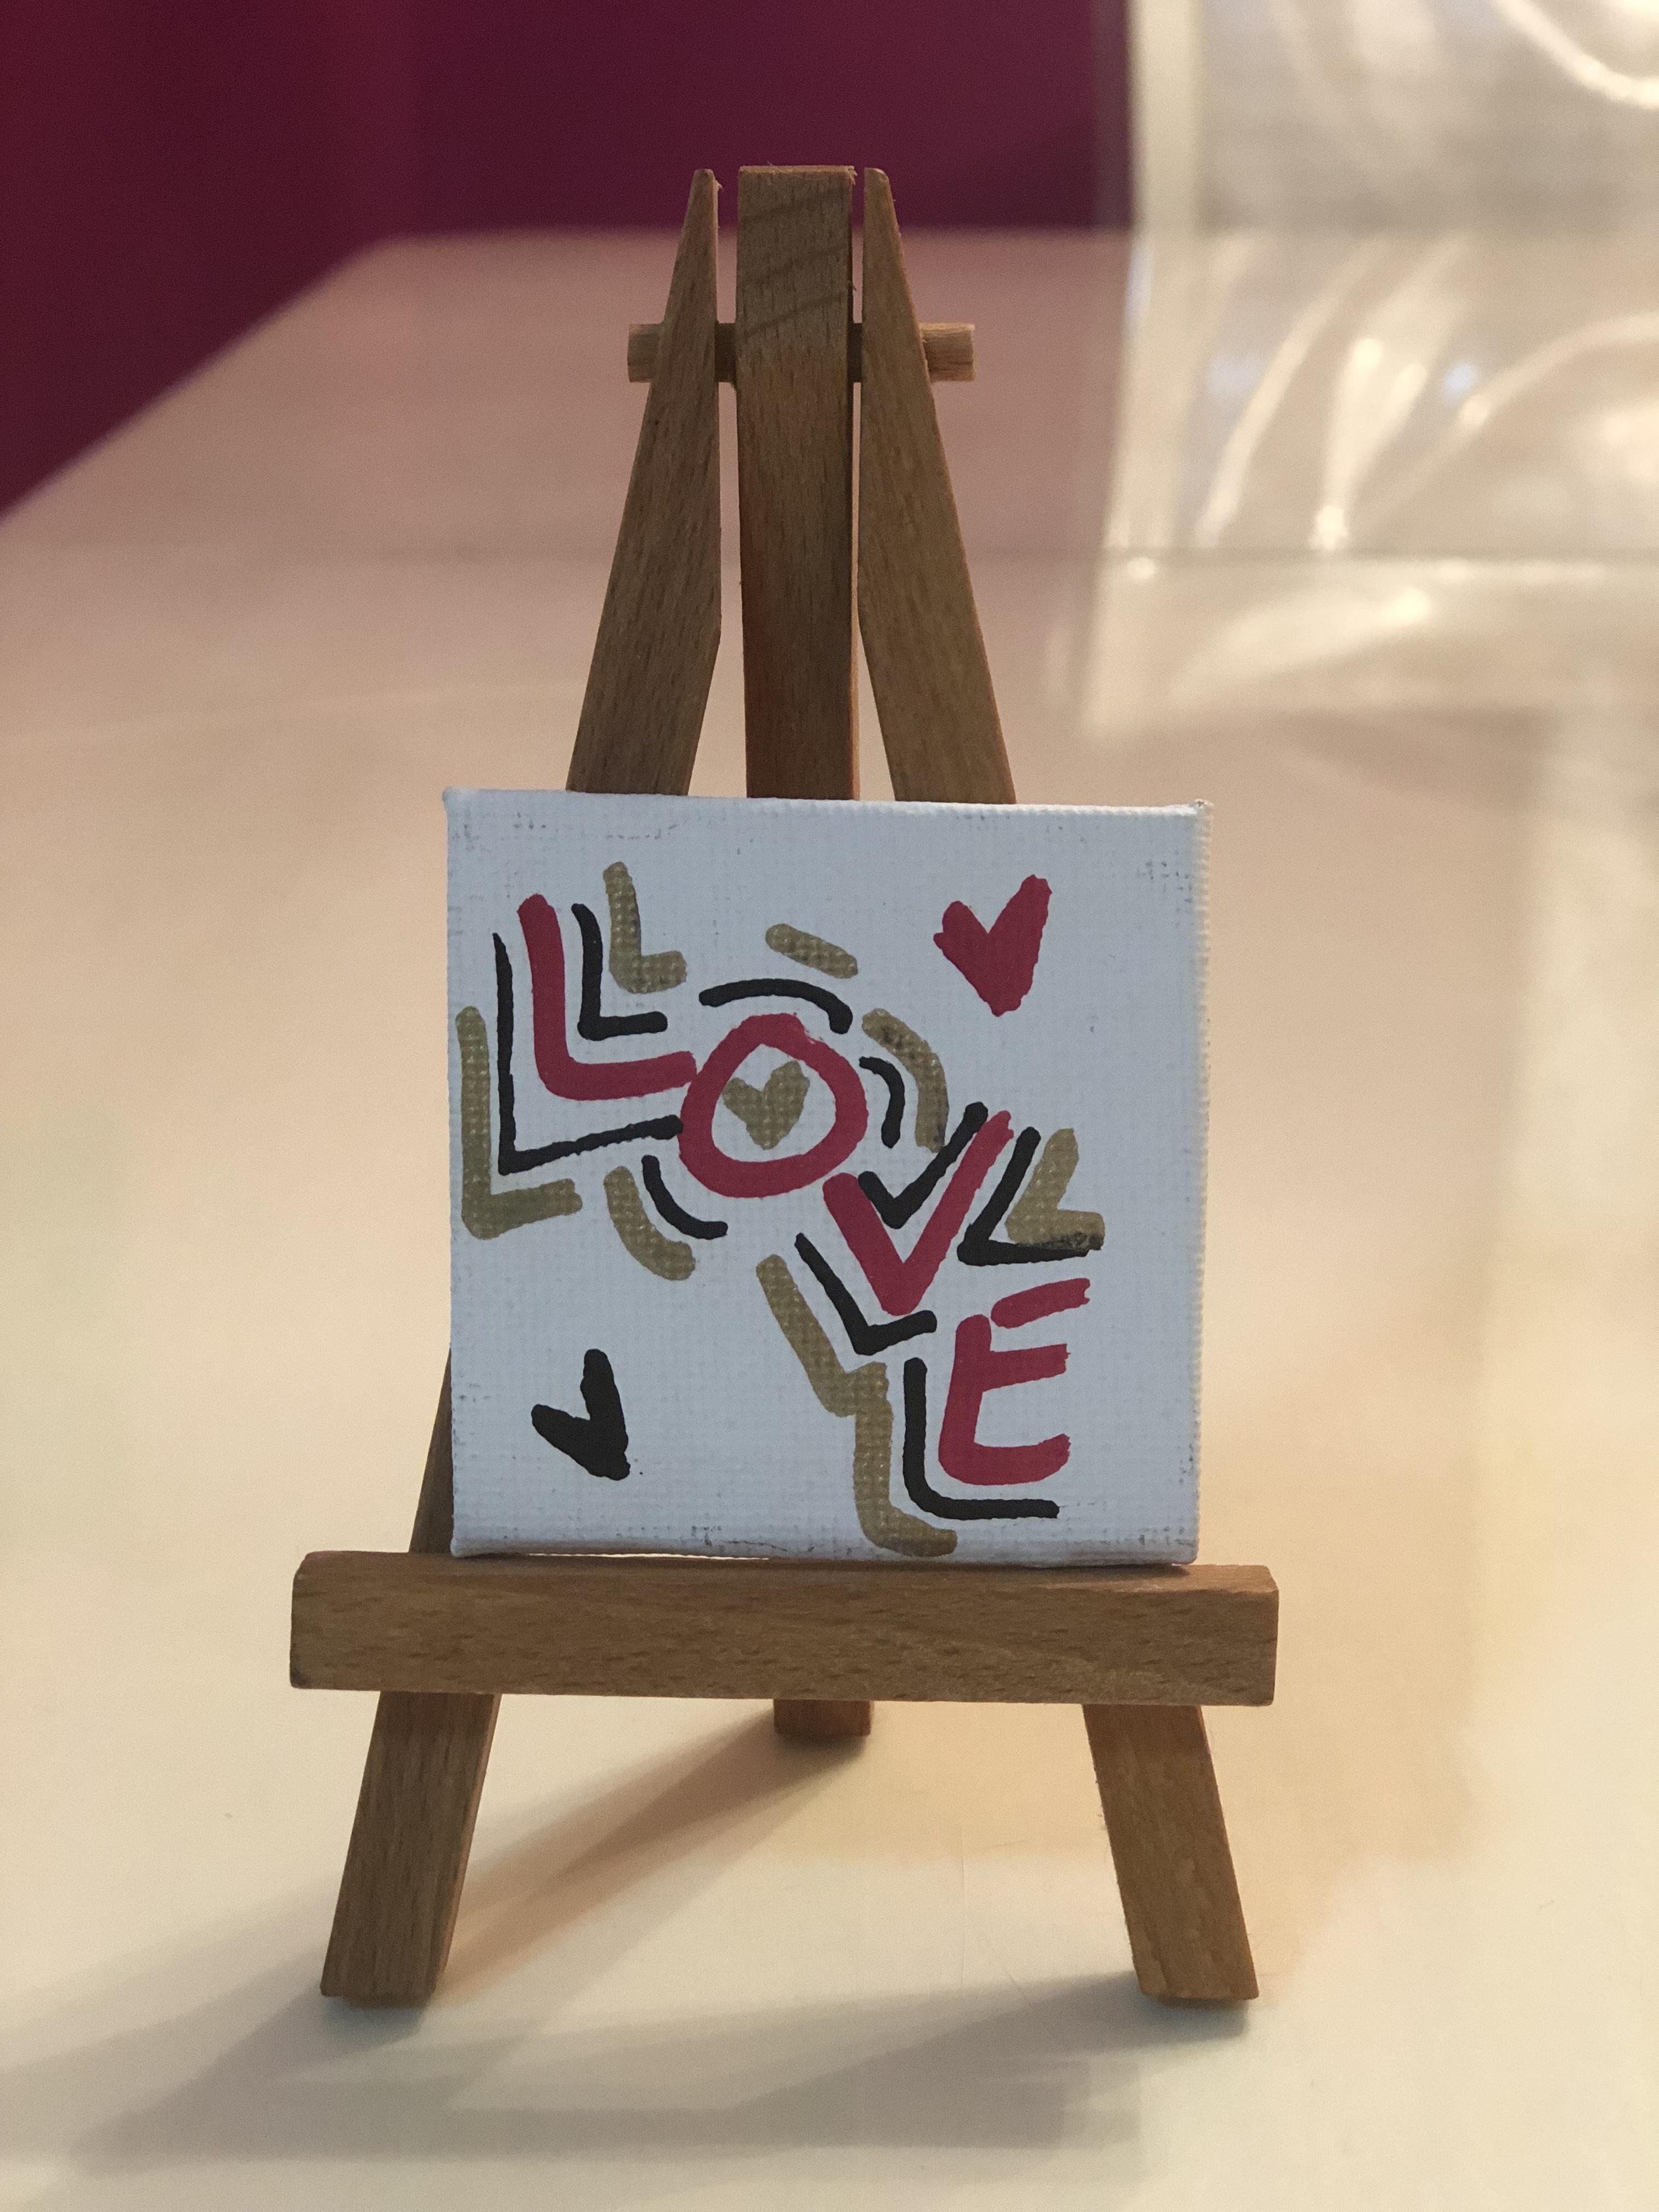 L O V E - Spells LOVE 003